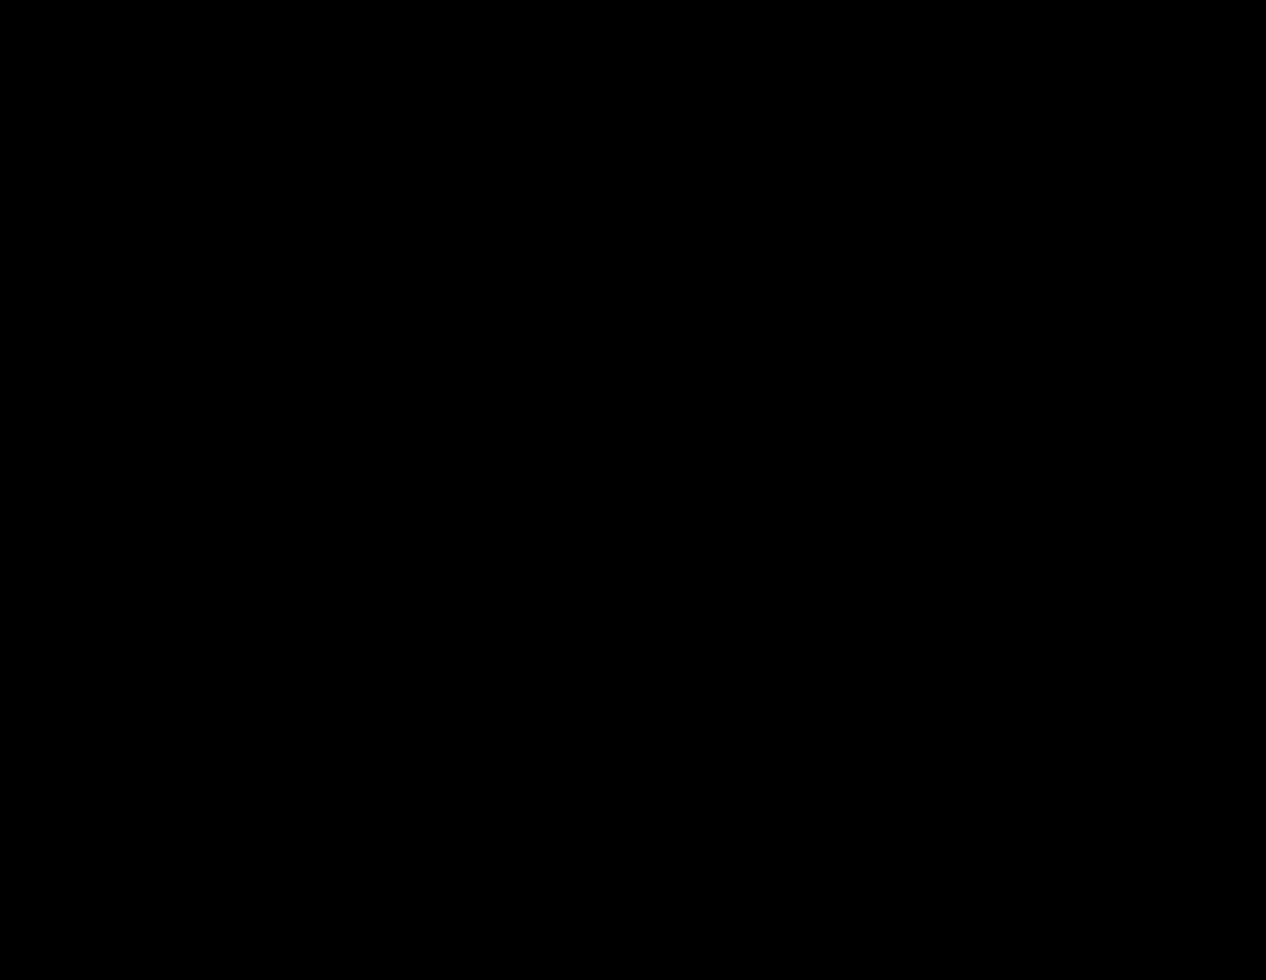 corte de fita png